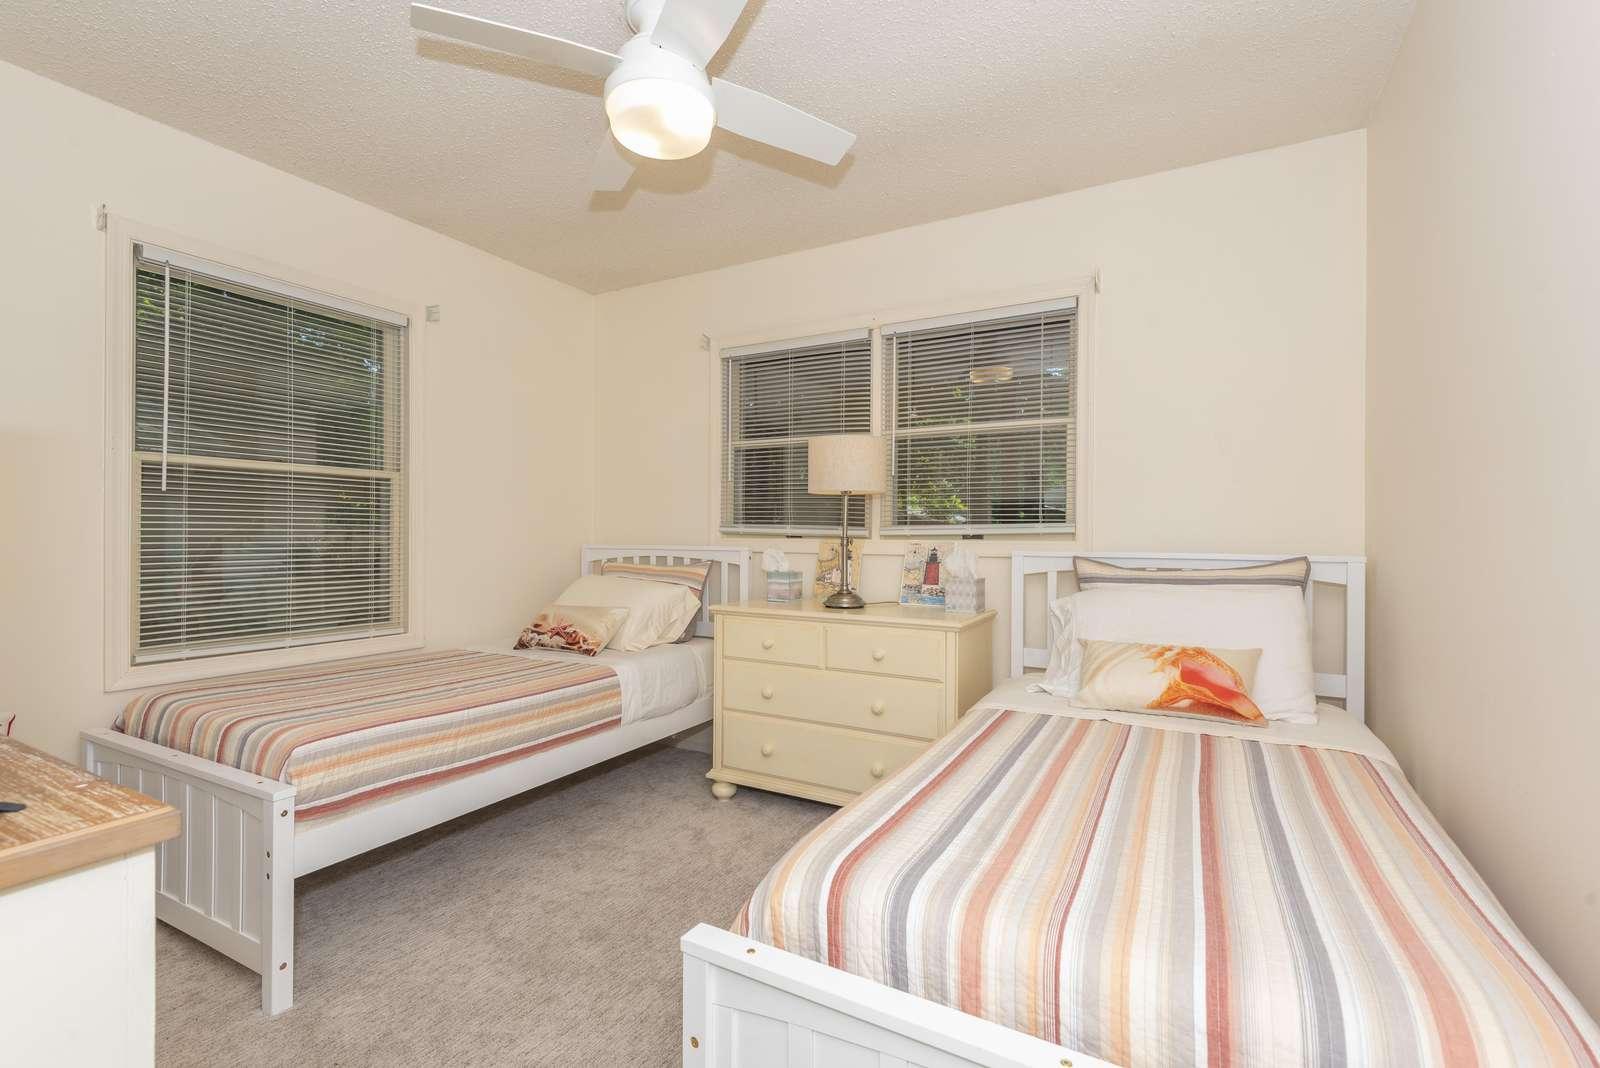 2nd bedroom very comfortable!